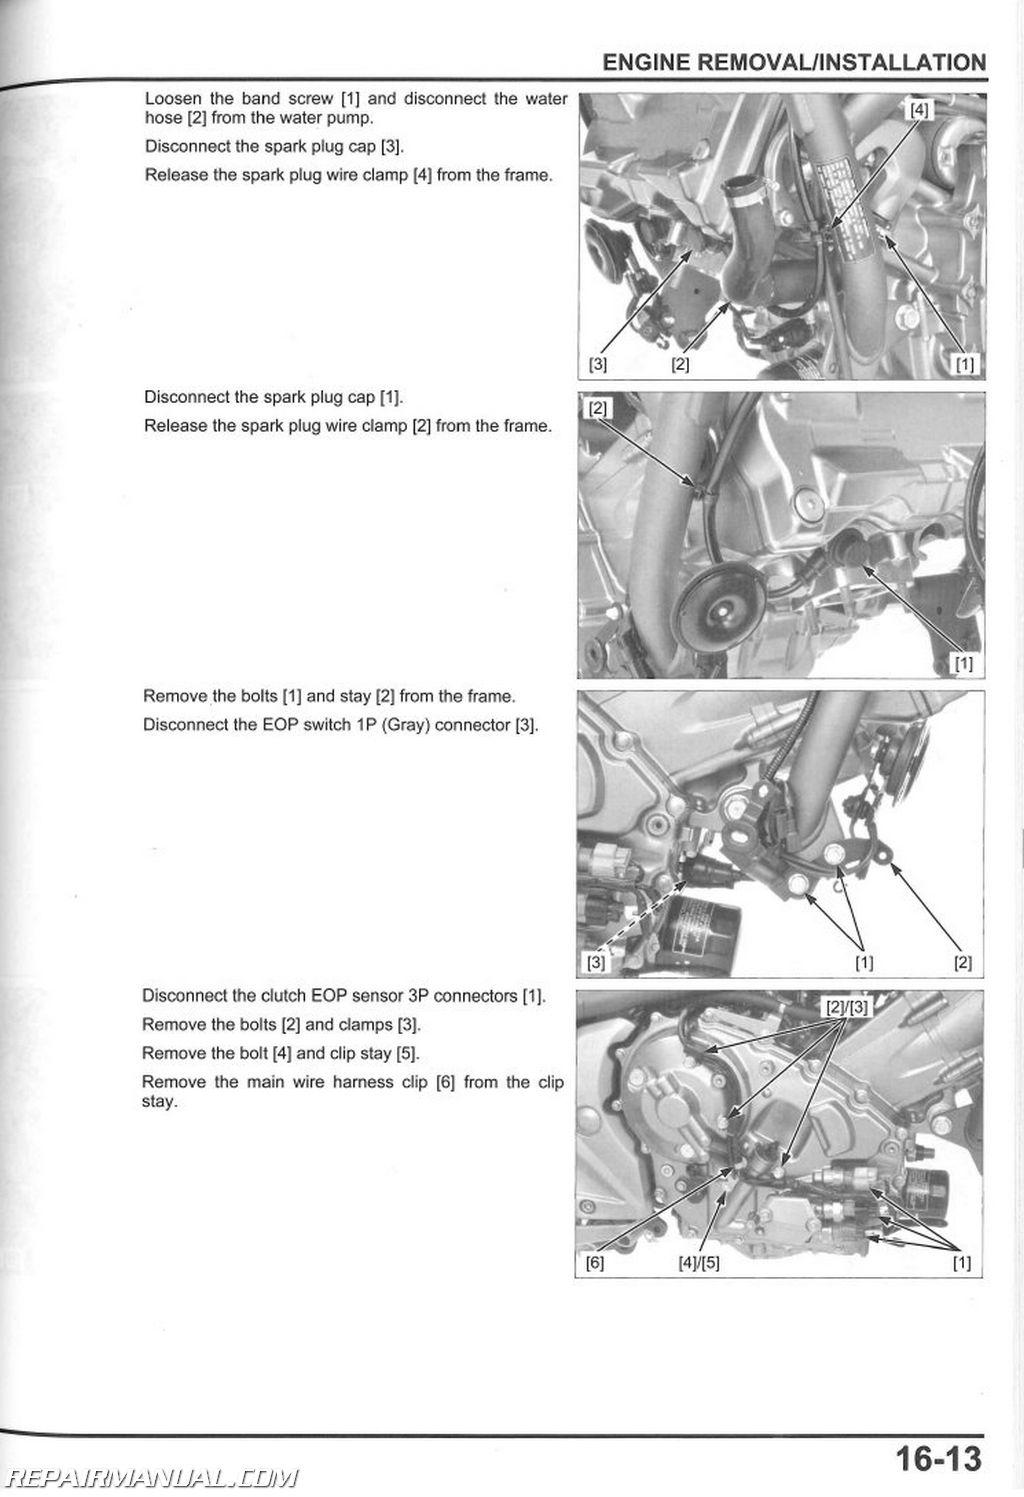 Honda Nc700x Xd Service Manual